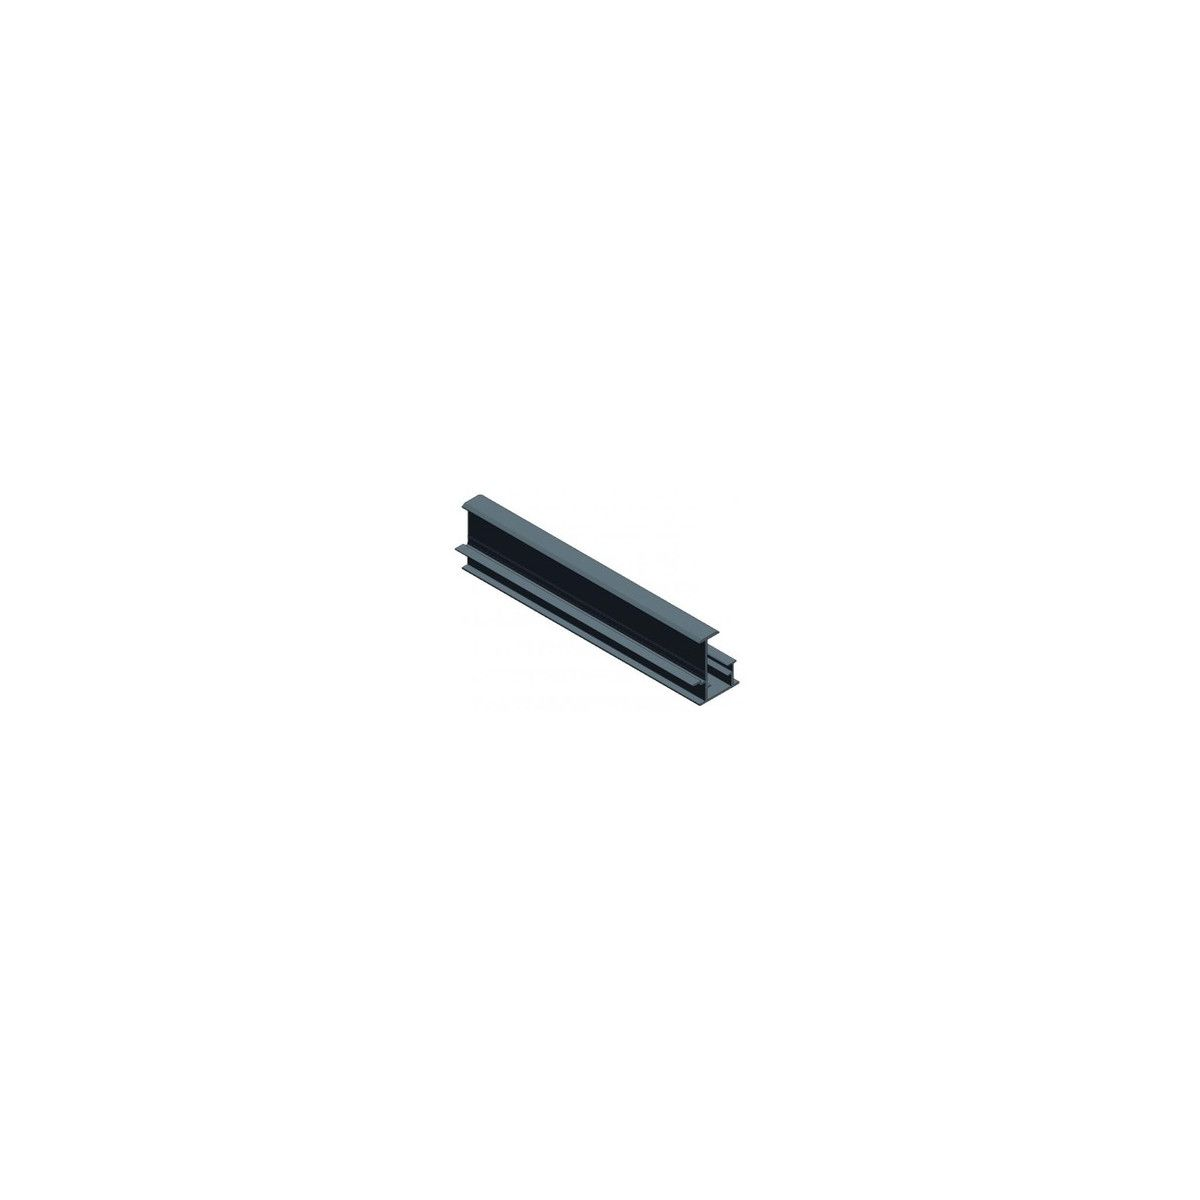 Flachstahl-Flachprofil 50x 20mm - 500mm 500-2000mm L/änge 50-80mm breiten S235JR EN 10058